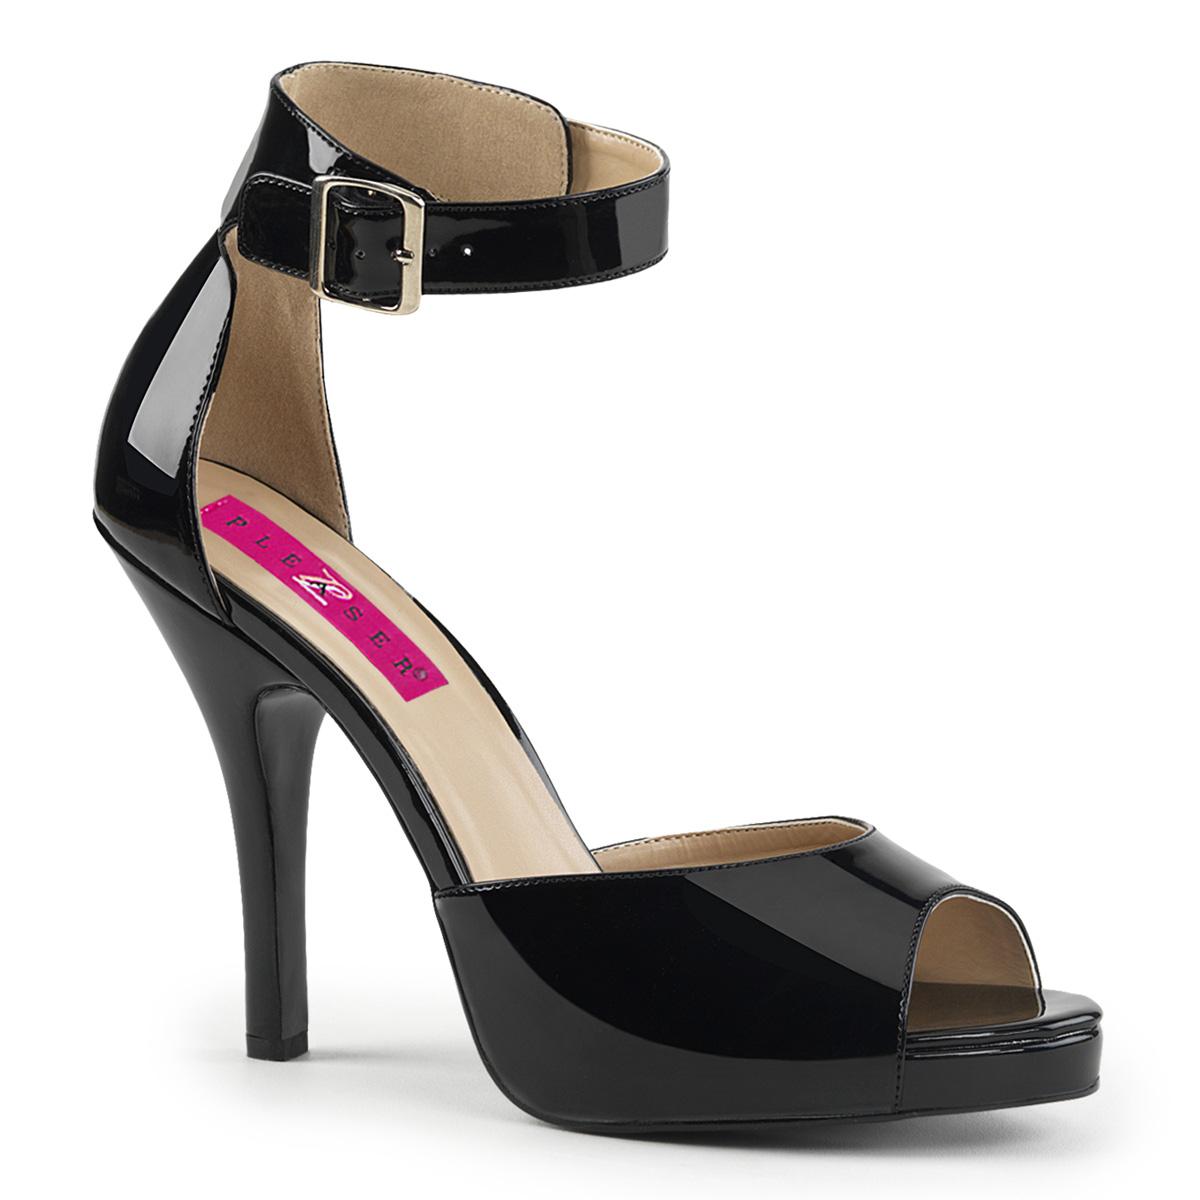 Pleaser Pink Label Eve-02 Ankle Strap Sandal (Women's)